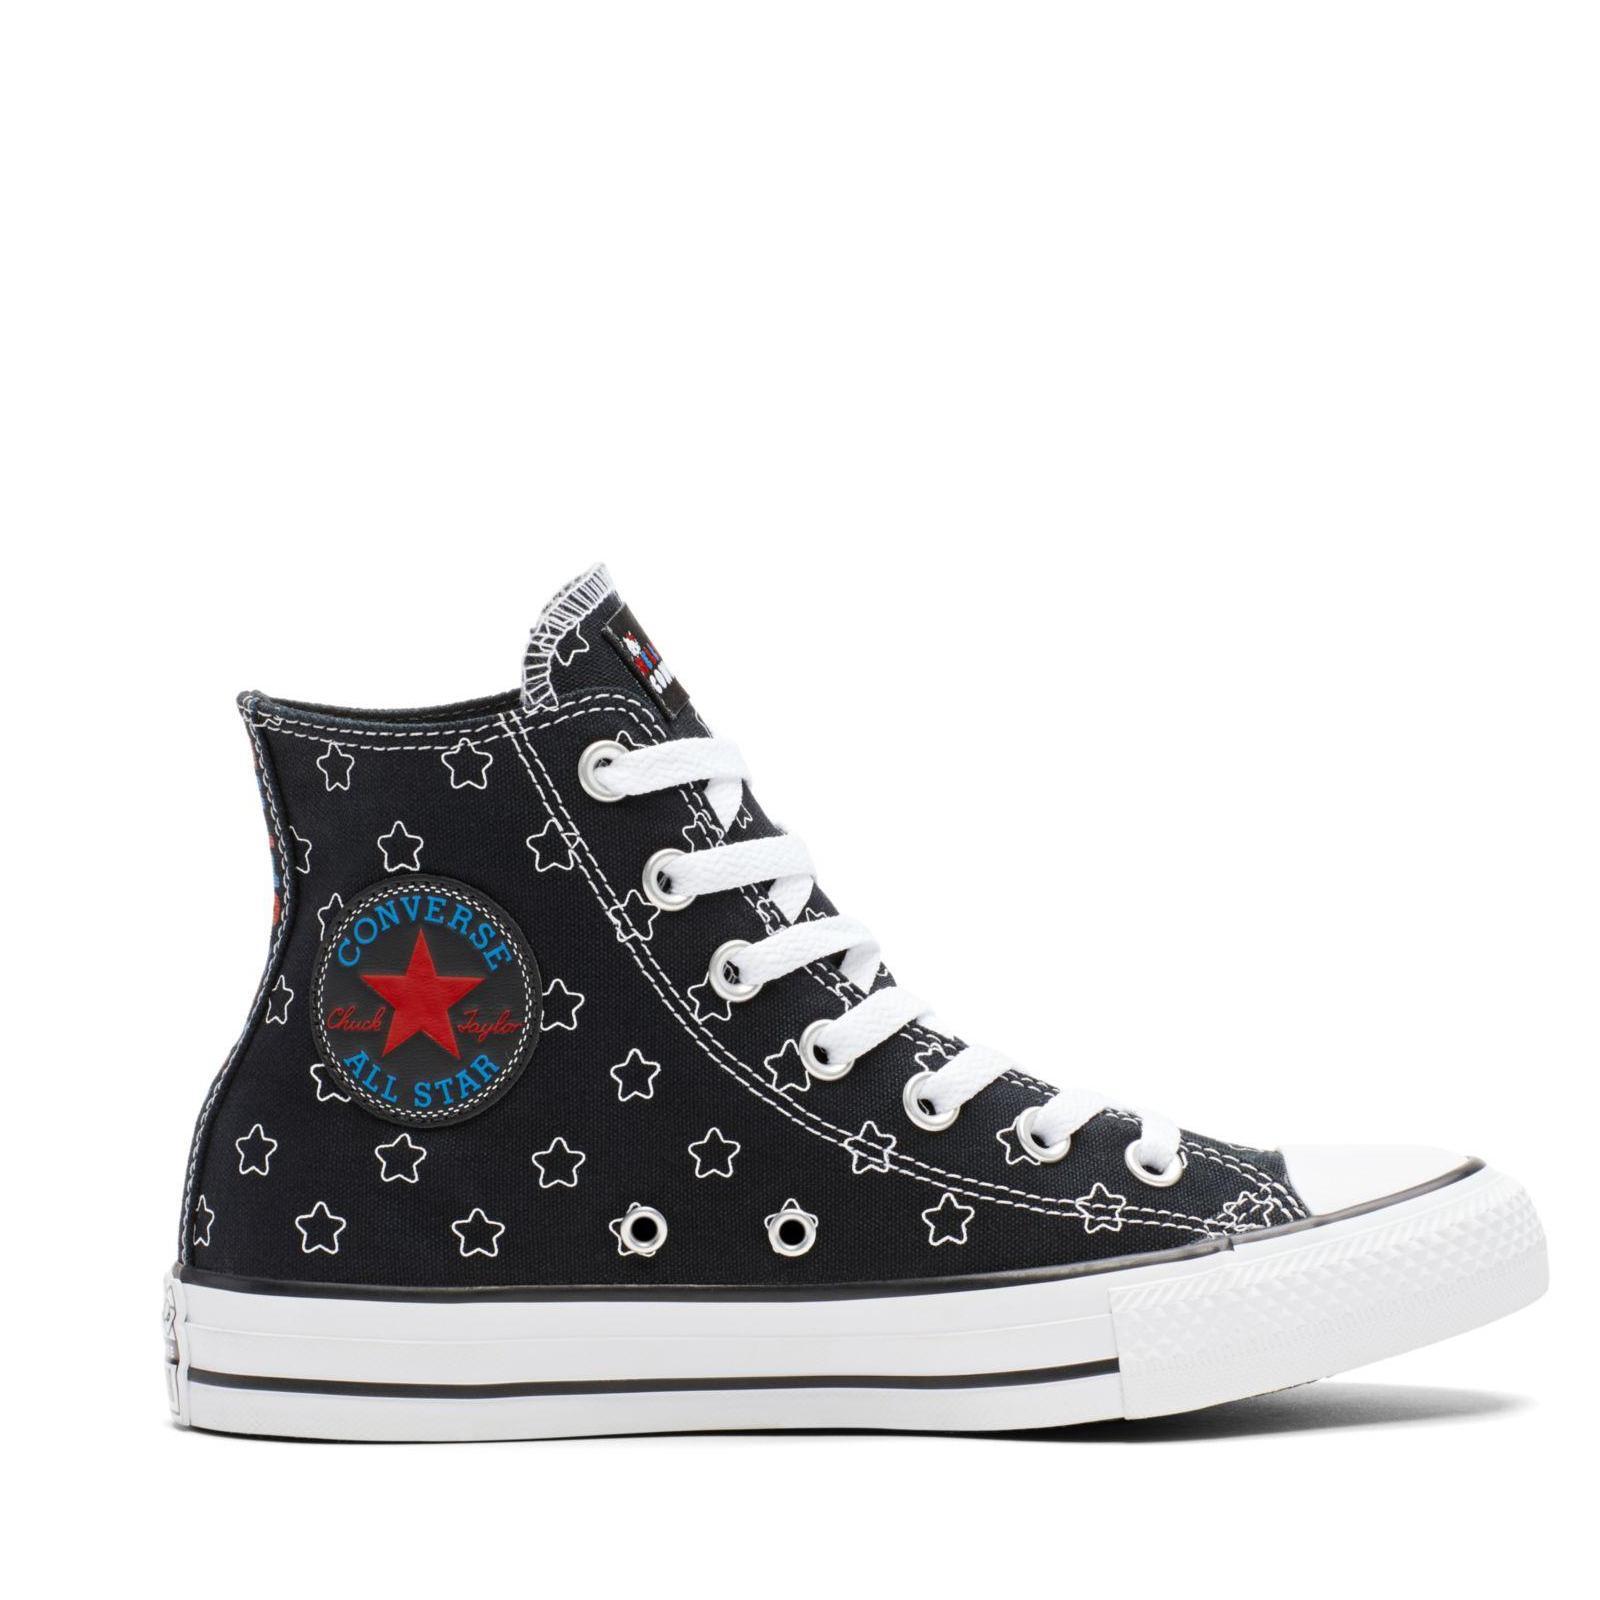 50de8015dd [SALE] CONVERSE X HELLO KITTY CHUCK TAYLOR ALL STAR HI - BLACK/WHITE/  DIRECTOIRE BLUE - 163919C